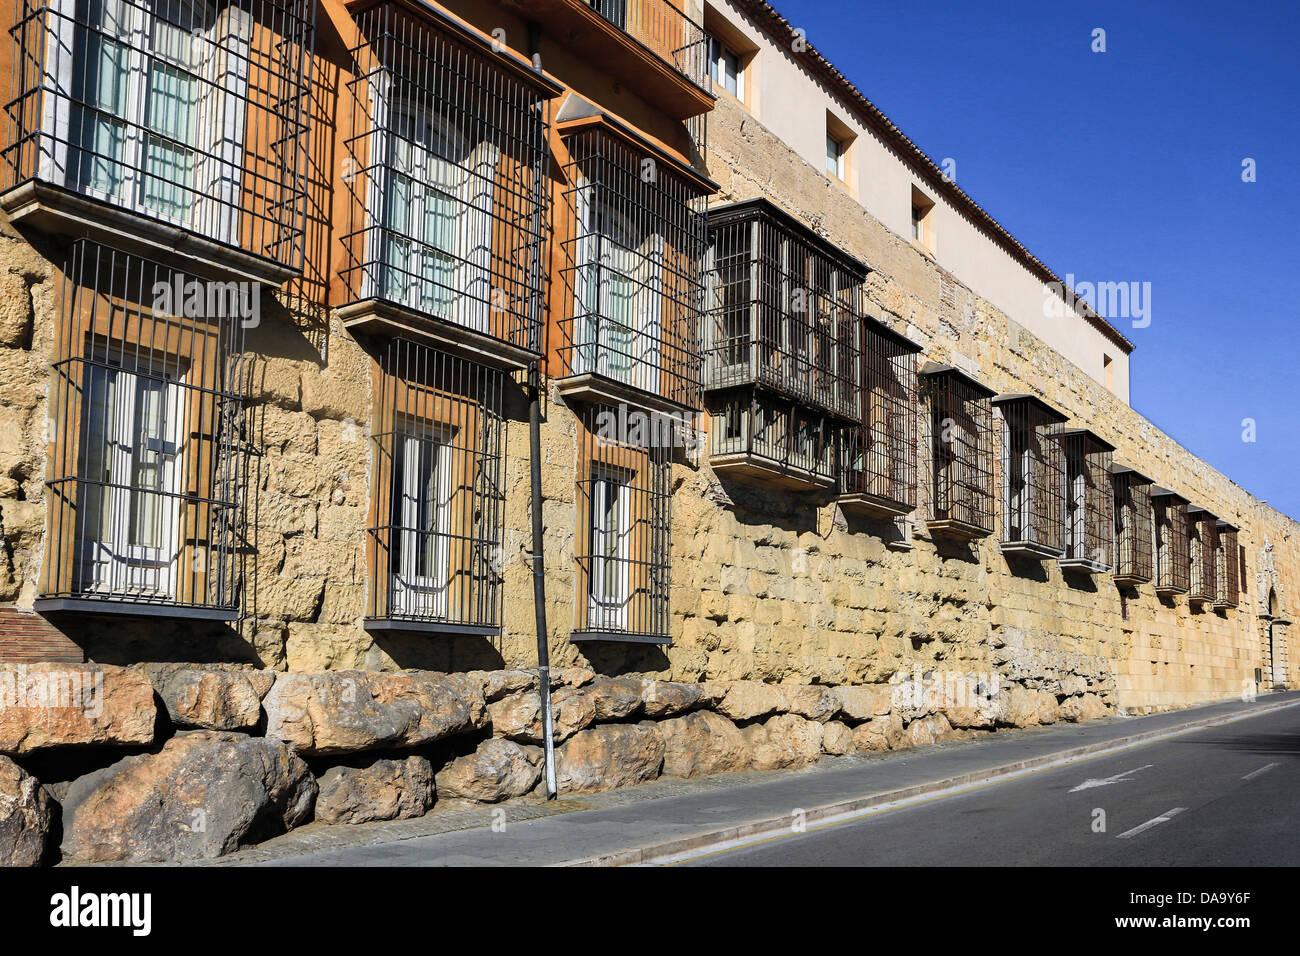 Spain, Europe, Catalonia, big, history, Iberia, Iberian, old Drago, roman, ruins, stones, tarraco, Tarragona, unesco, - Stock Image